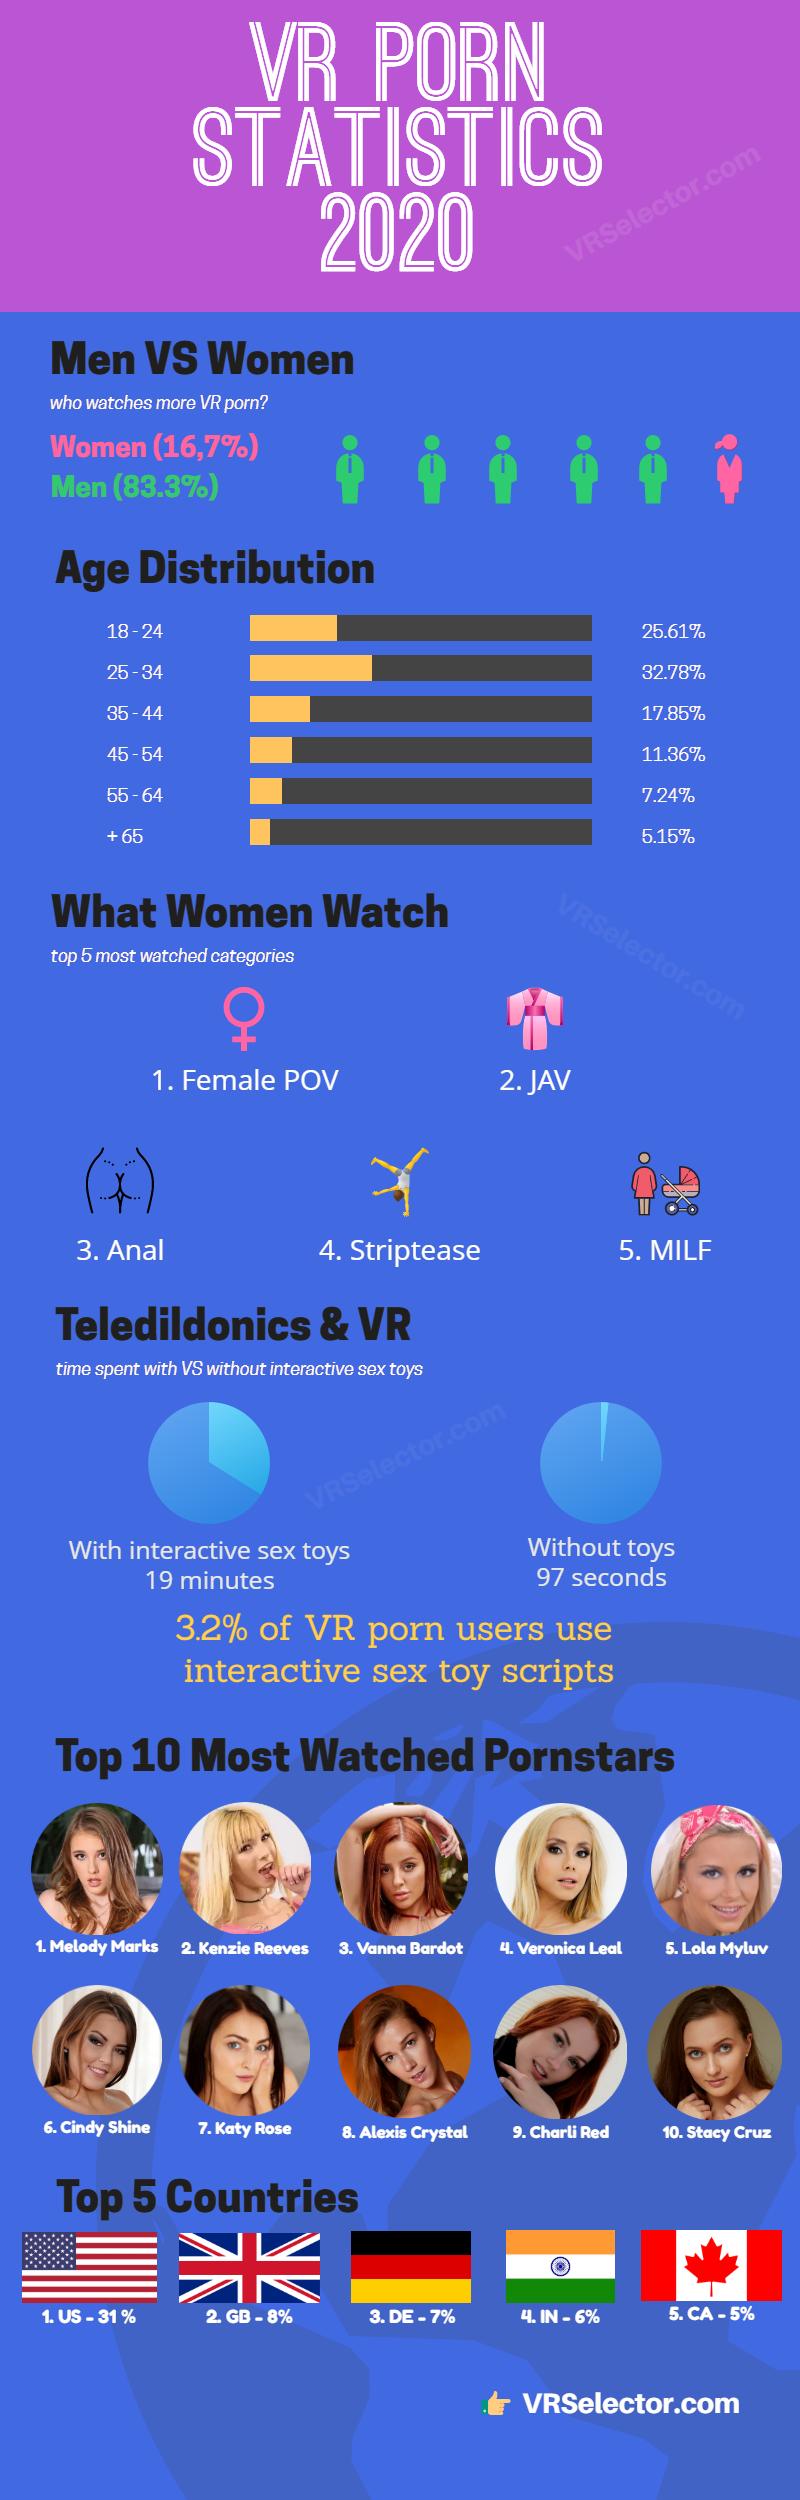 vr porn statistics 2020